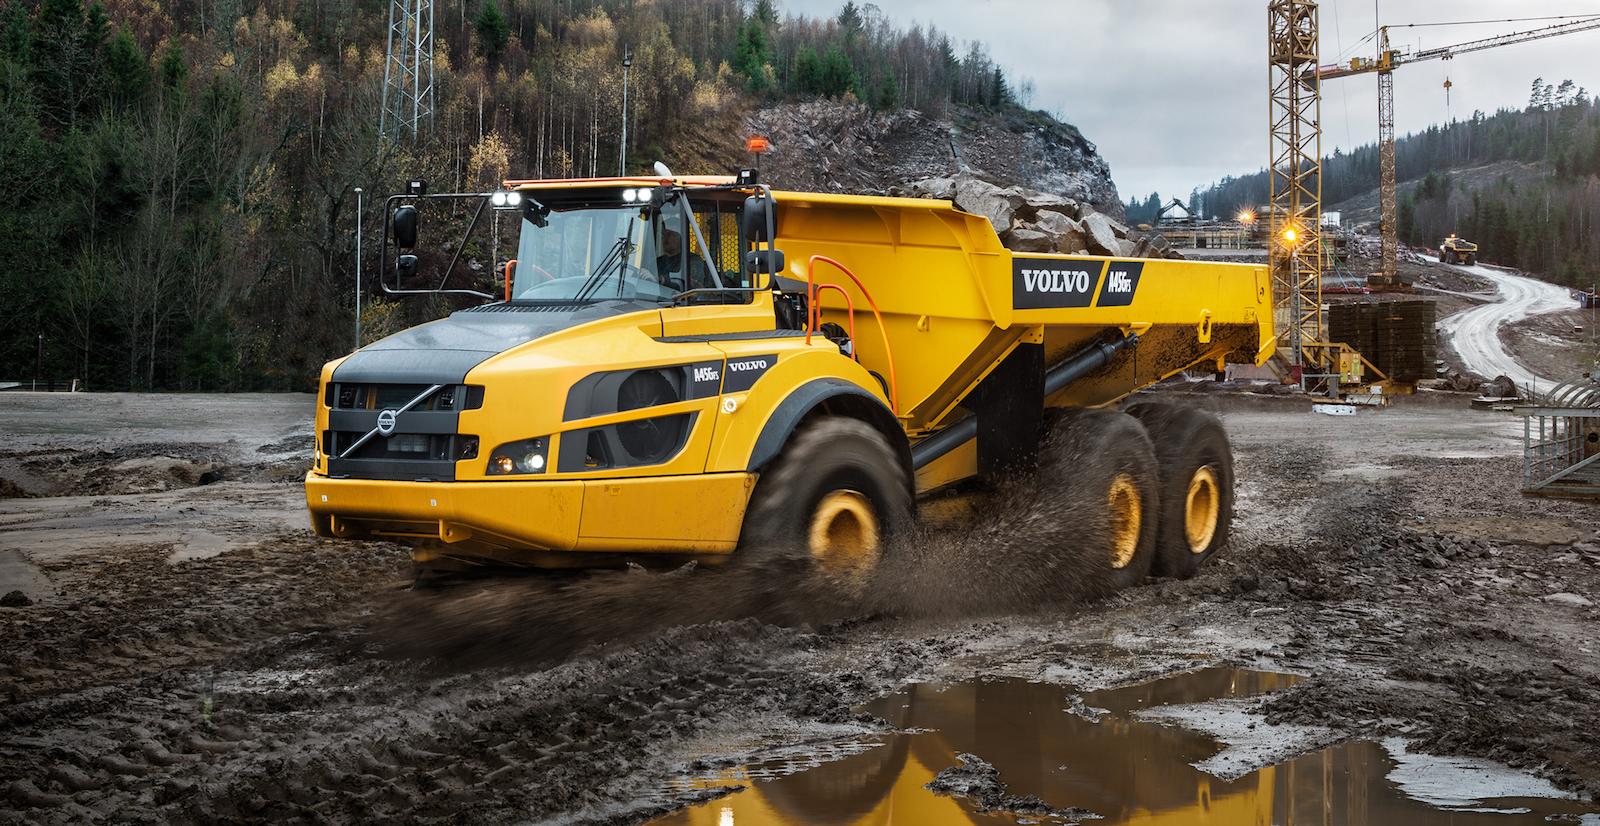 Volvo Dumper a45gfs